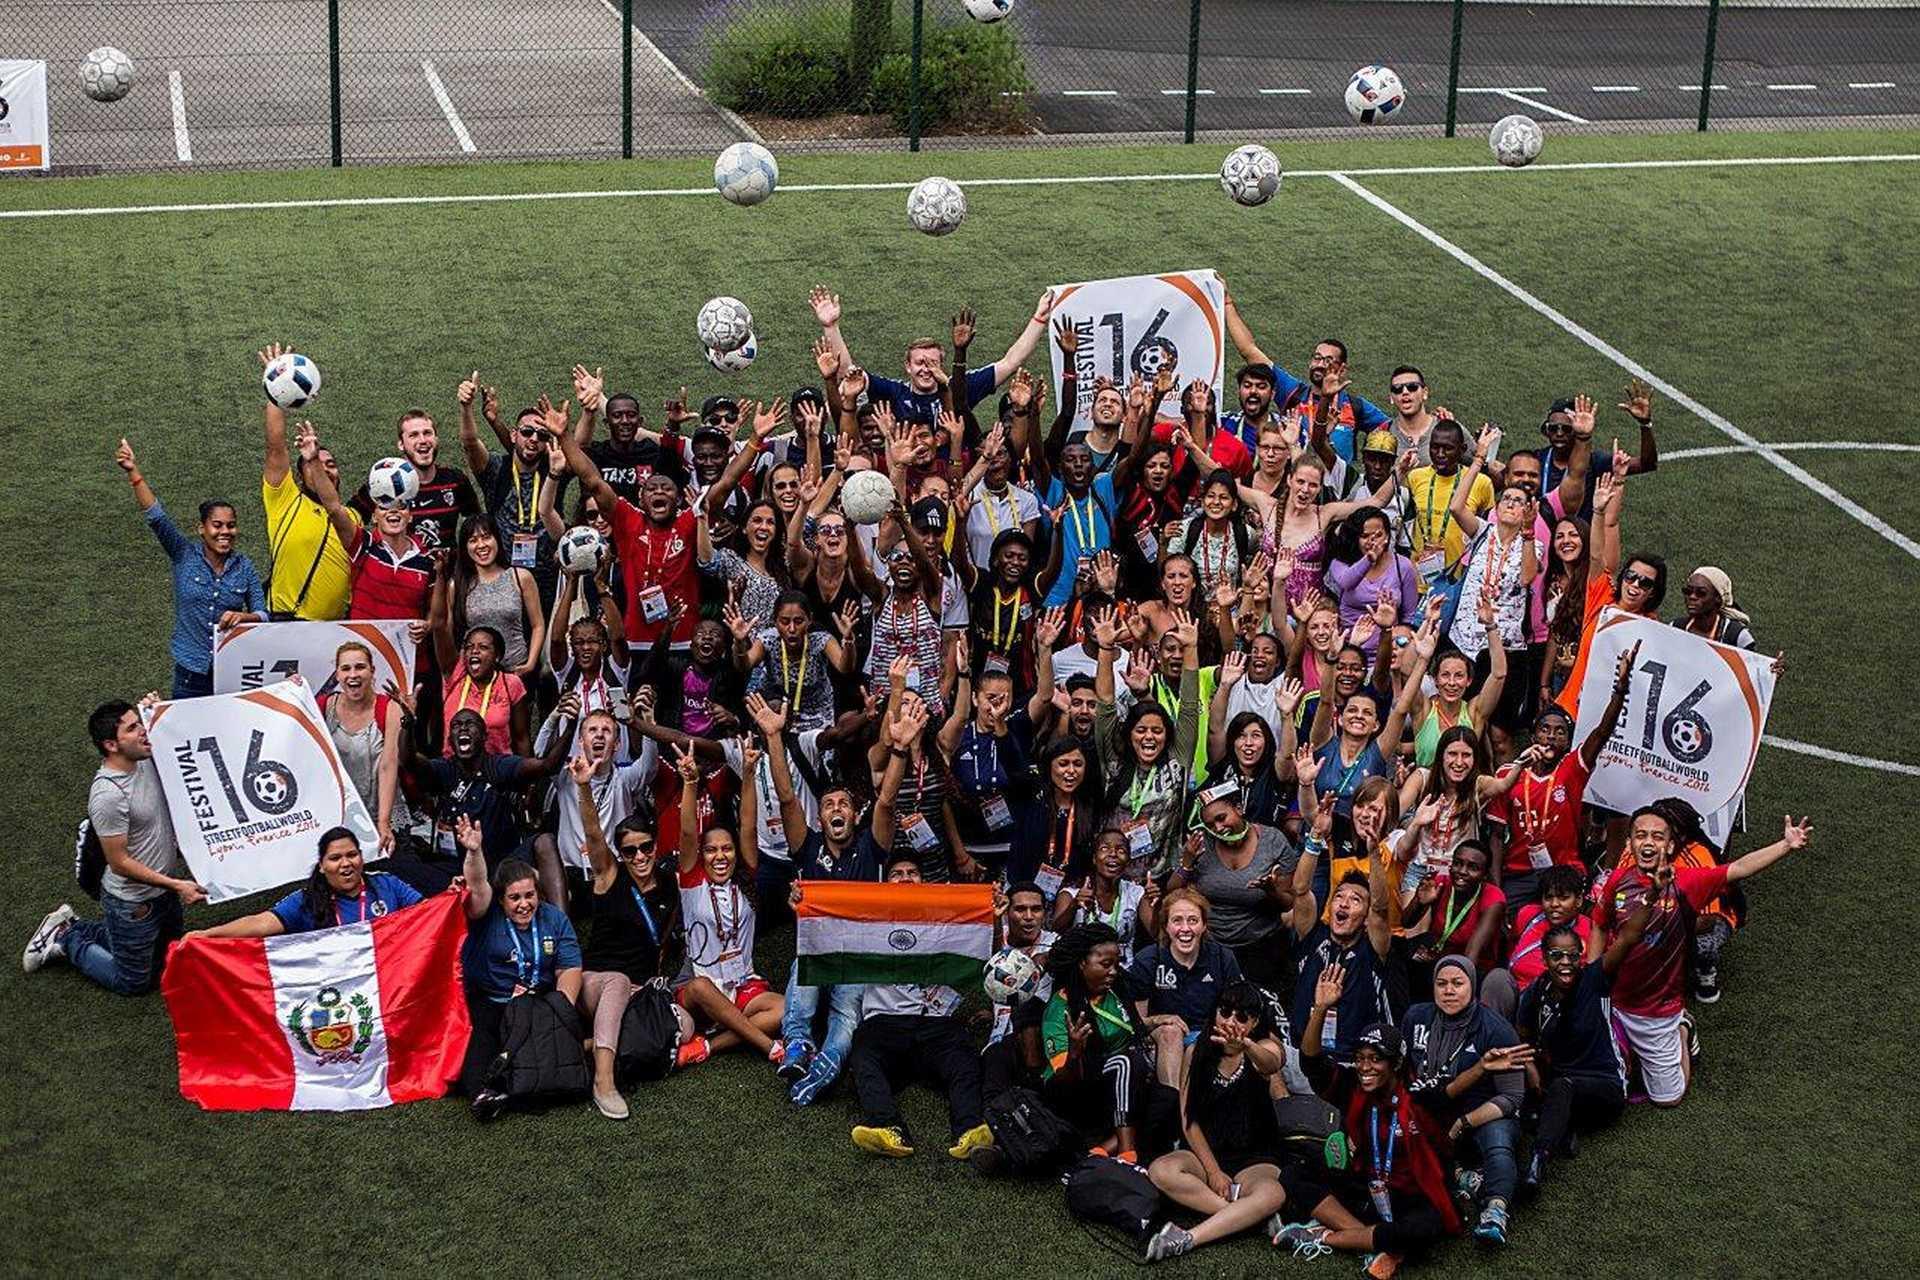 Football3 Festival 2017